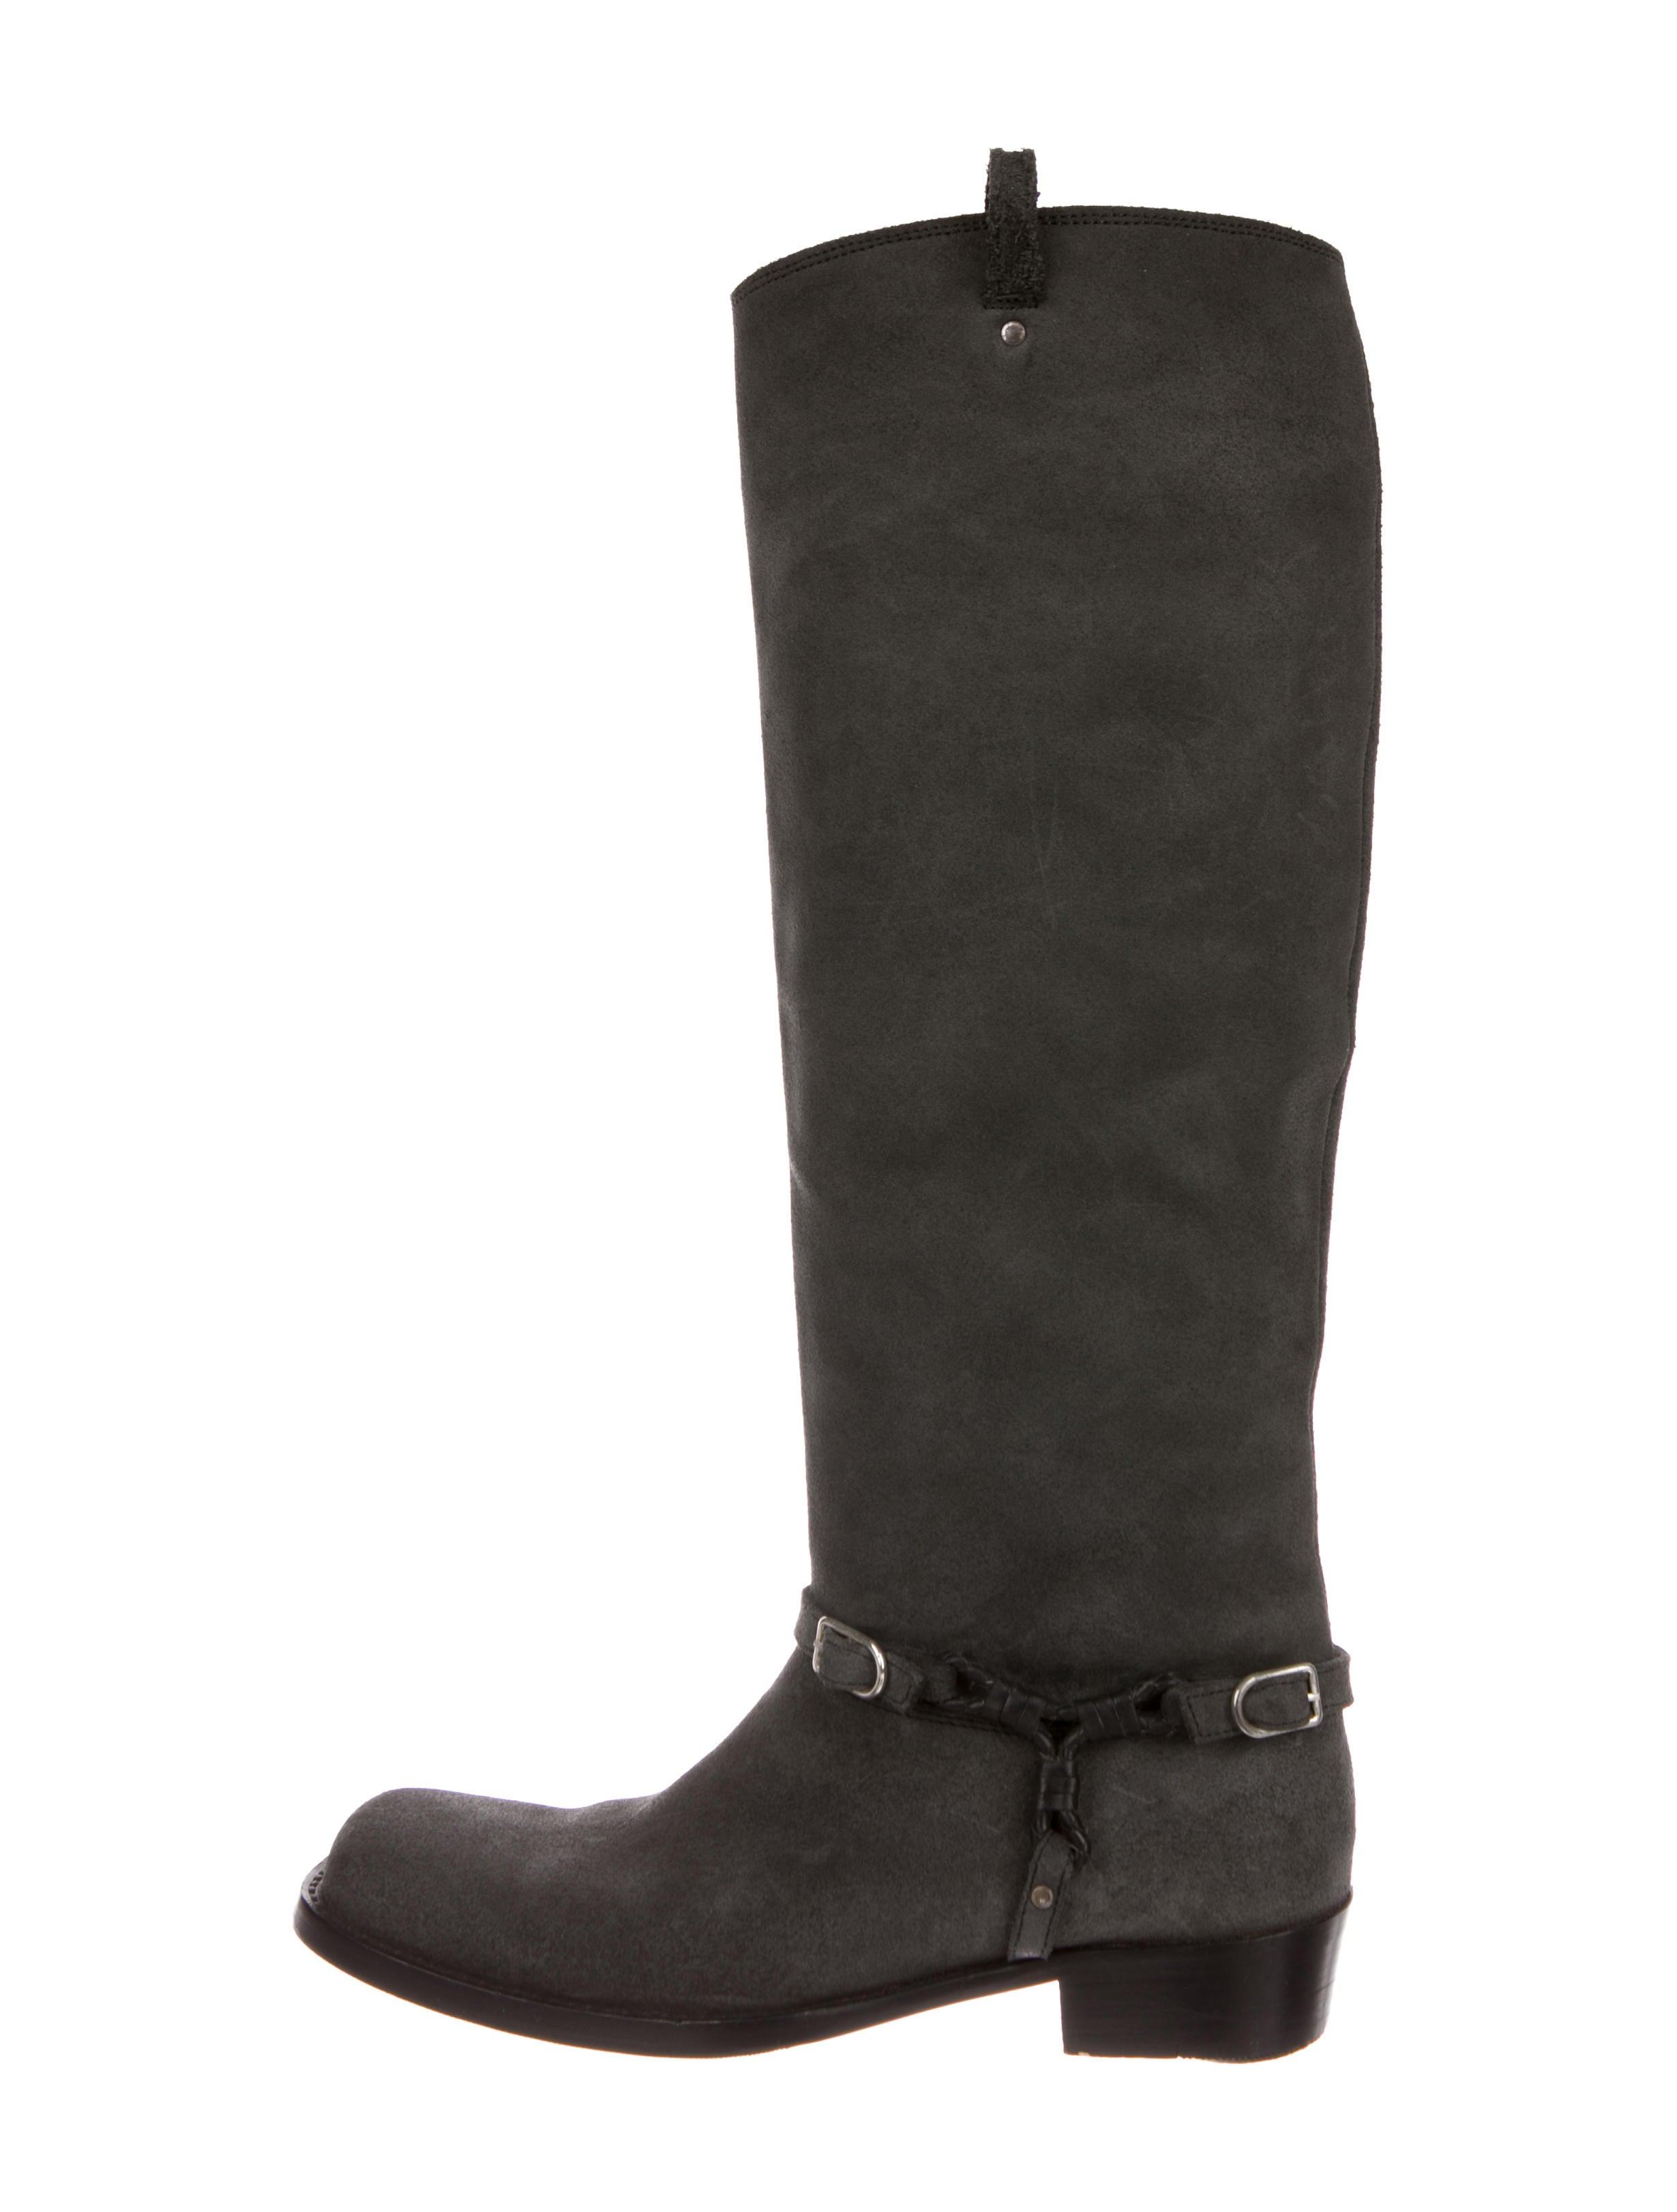 Bottega Veneta Nubuck Square-Toe Boots outlet store cheap online LllDfDGIC